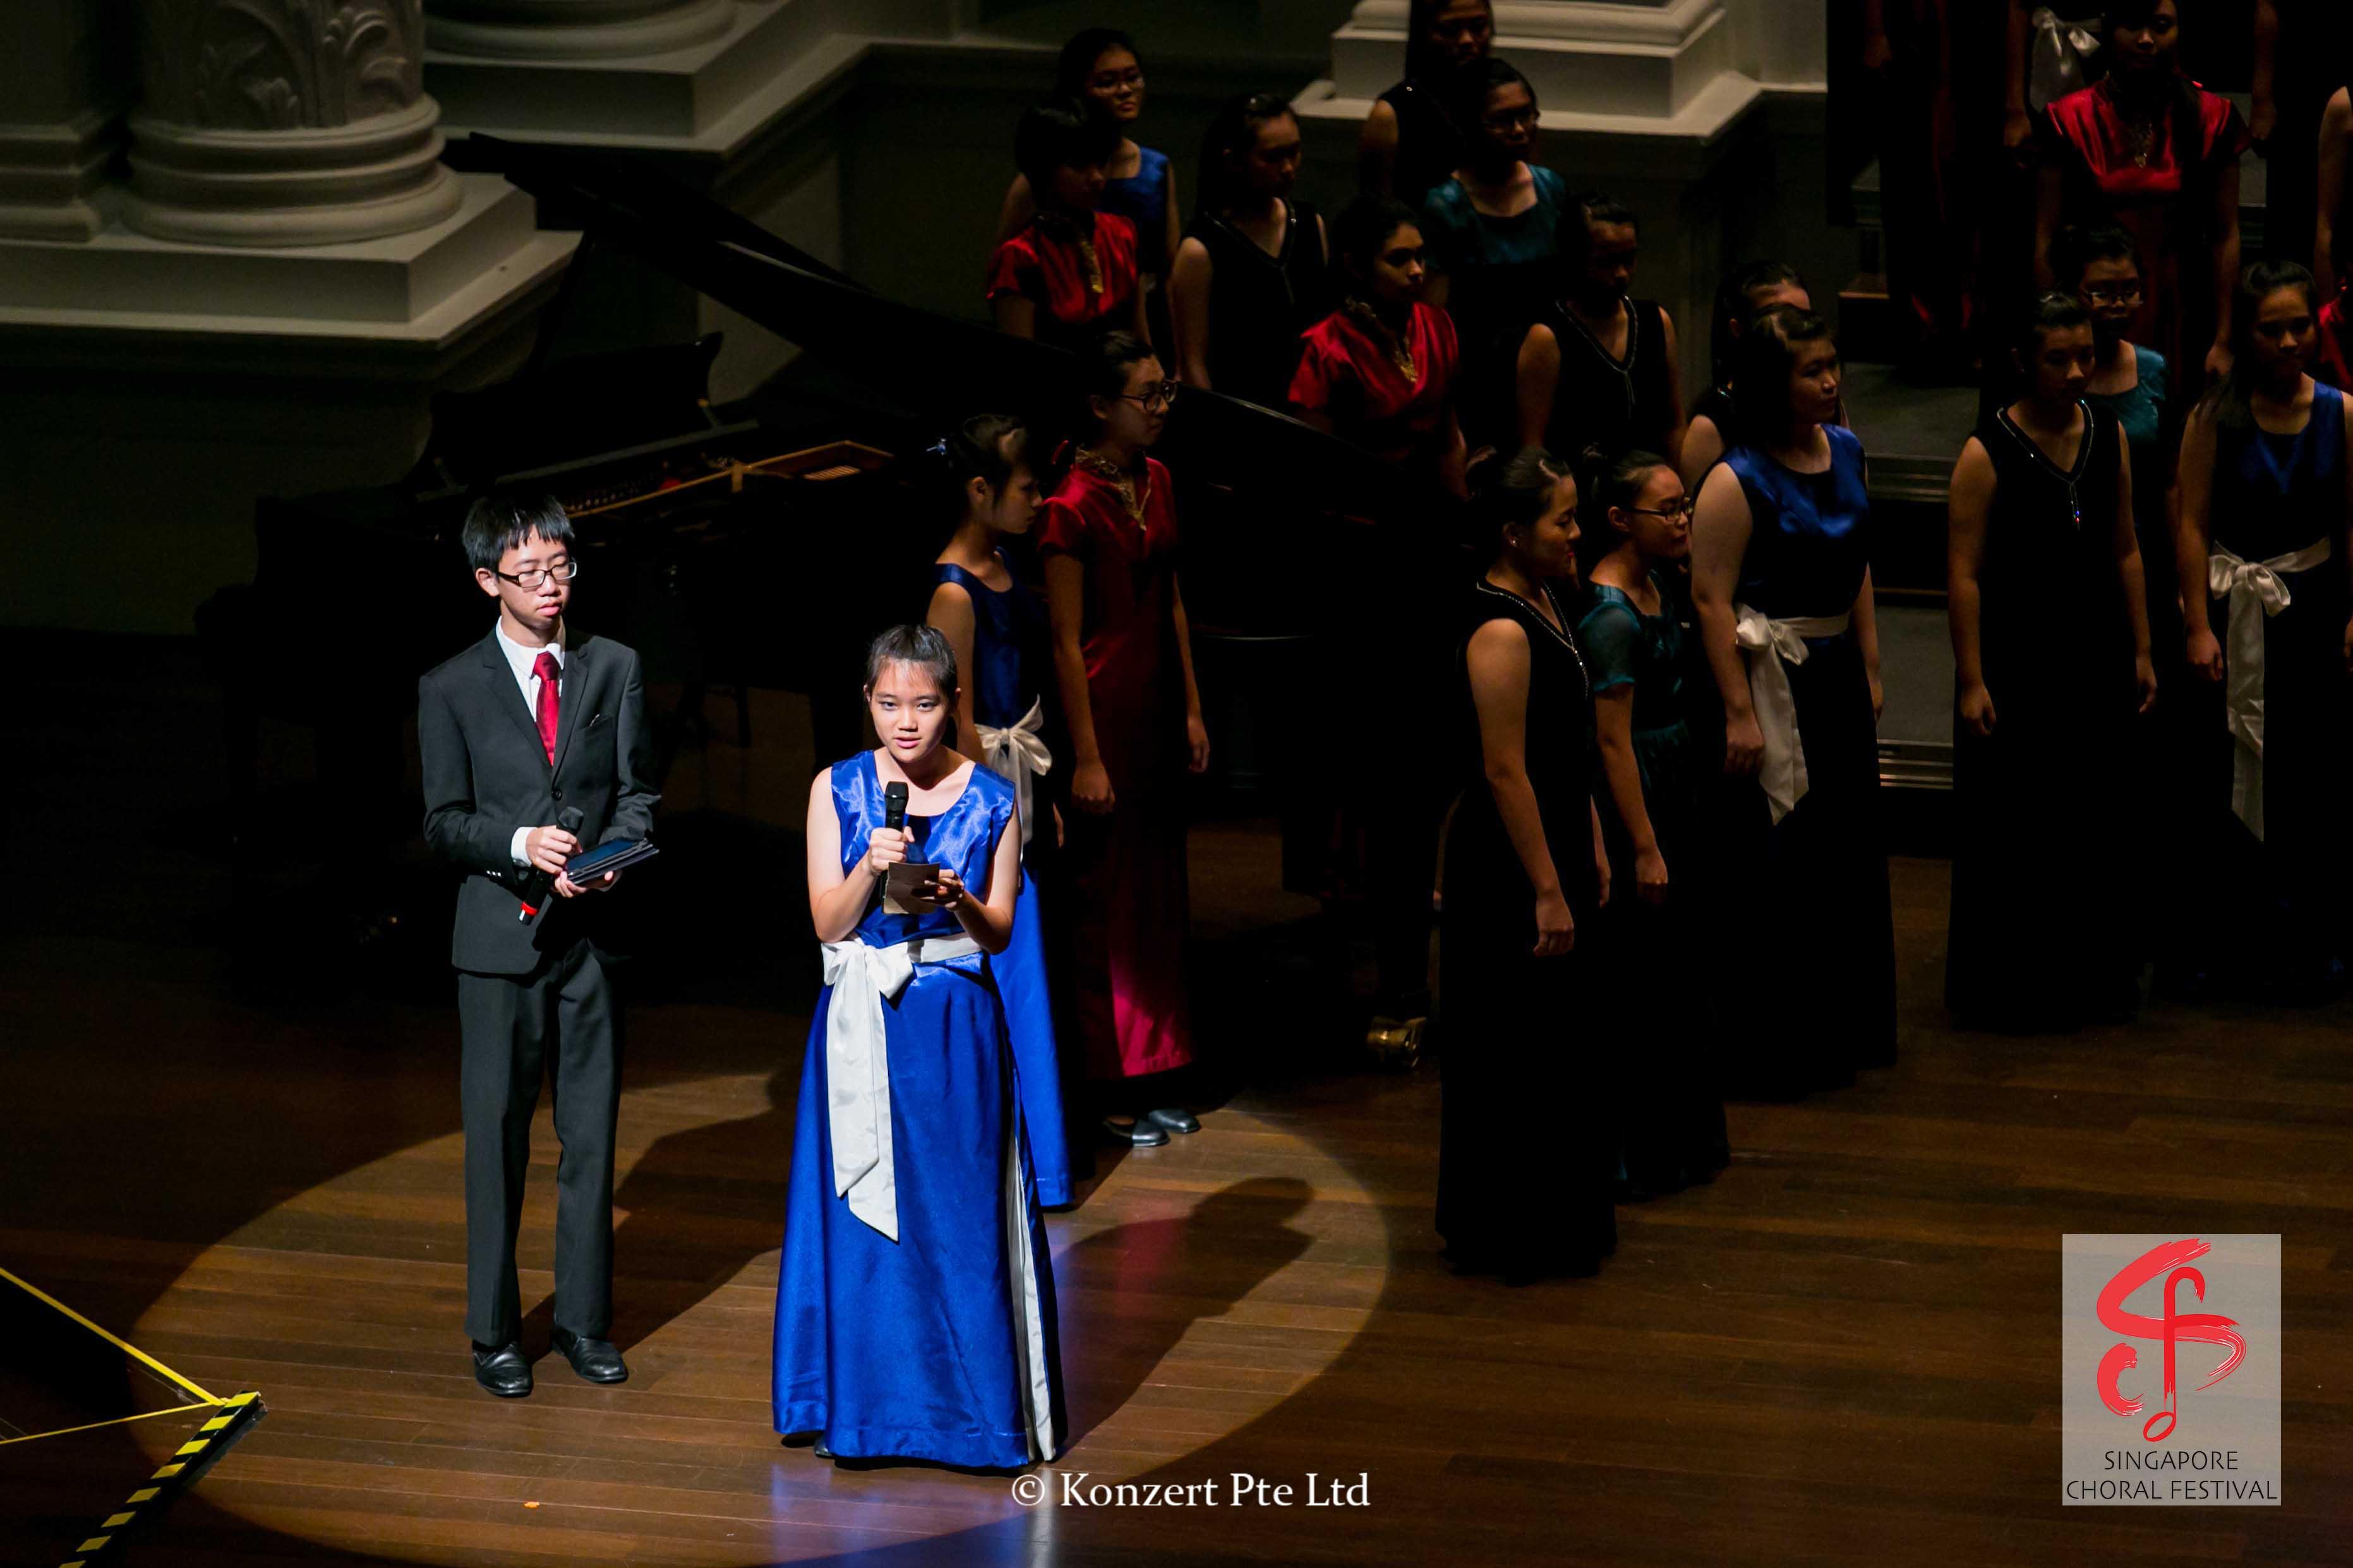 Singapore Choral Festival 7-8-15 (304).jpg